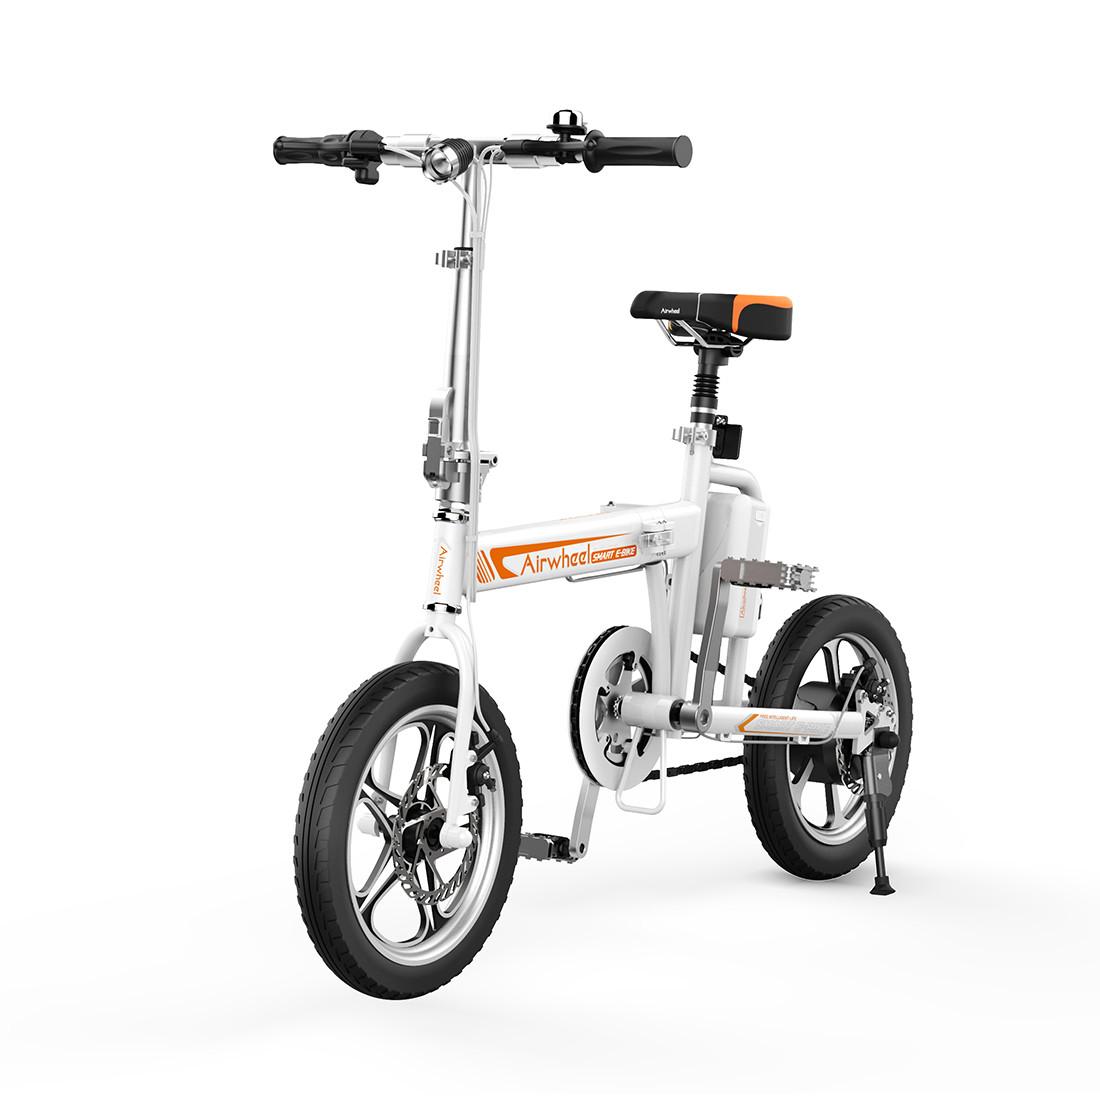 Электровелосипед, Airwheel, R5W, Скорость до 20 км/ч, Нагрузка до 100 кг, Белый